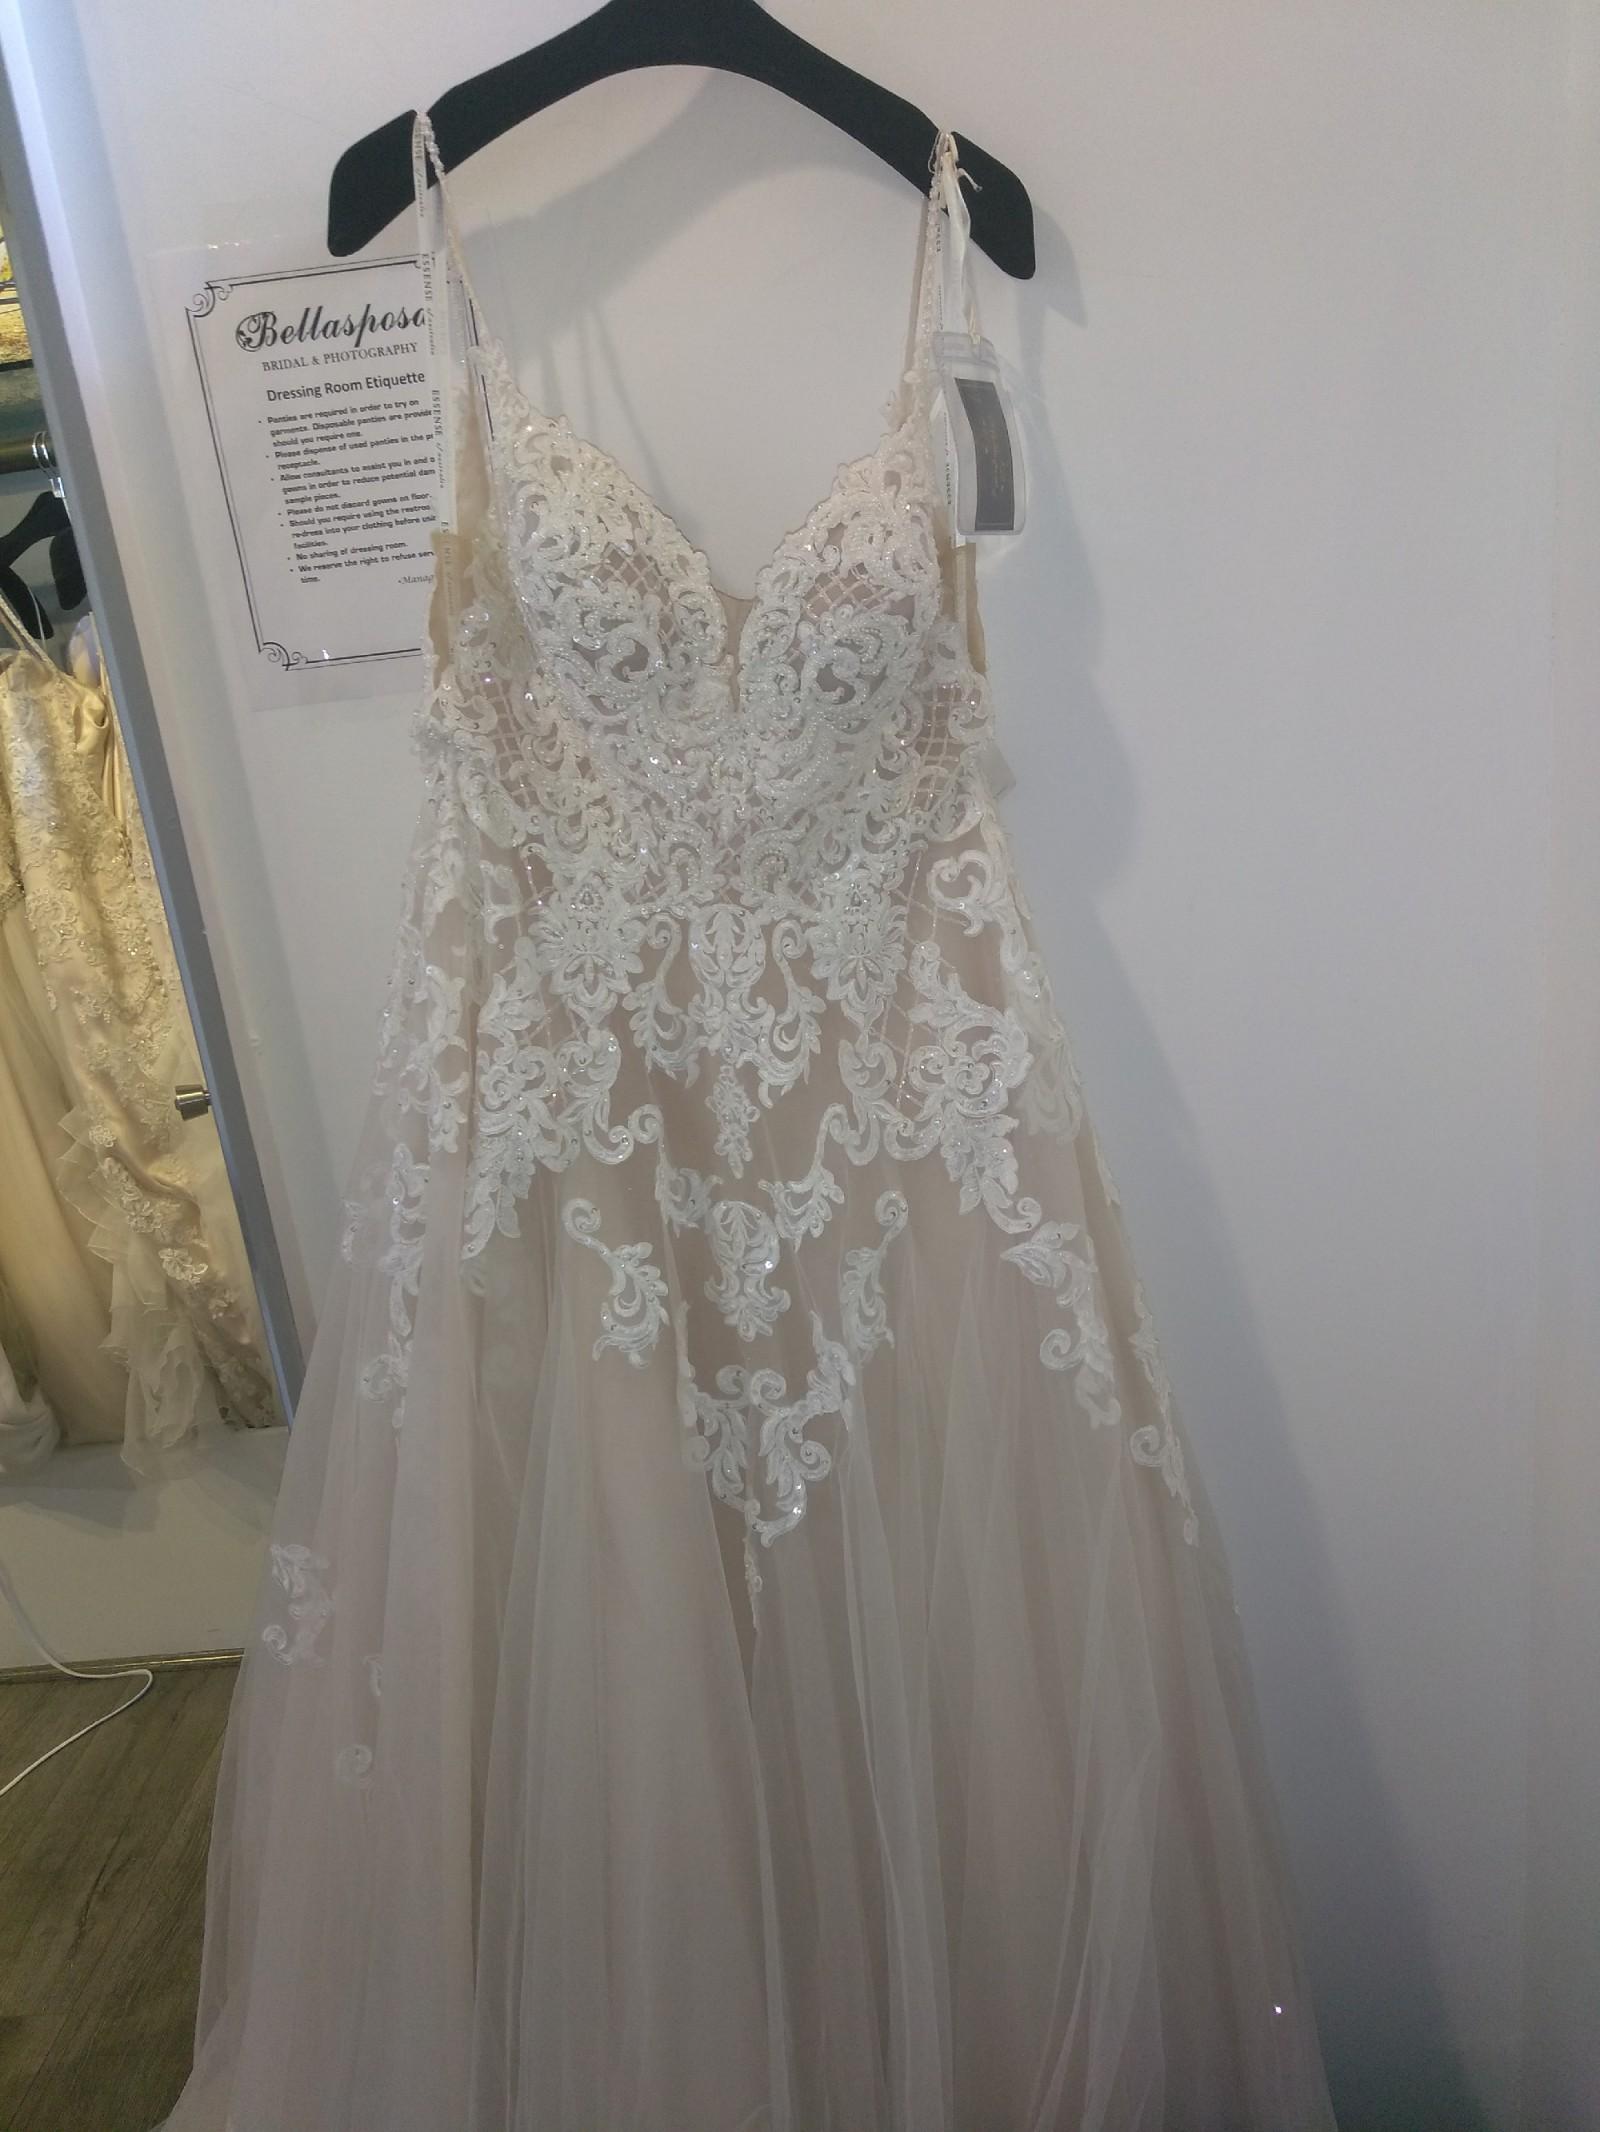 Wedding Dress Fabric.Essense Of Australia D2363 1q Modern Boho Wedding Dress Fabric Lace Wedding Dress On Sale 32 Off